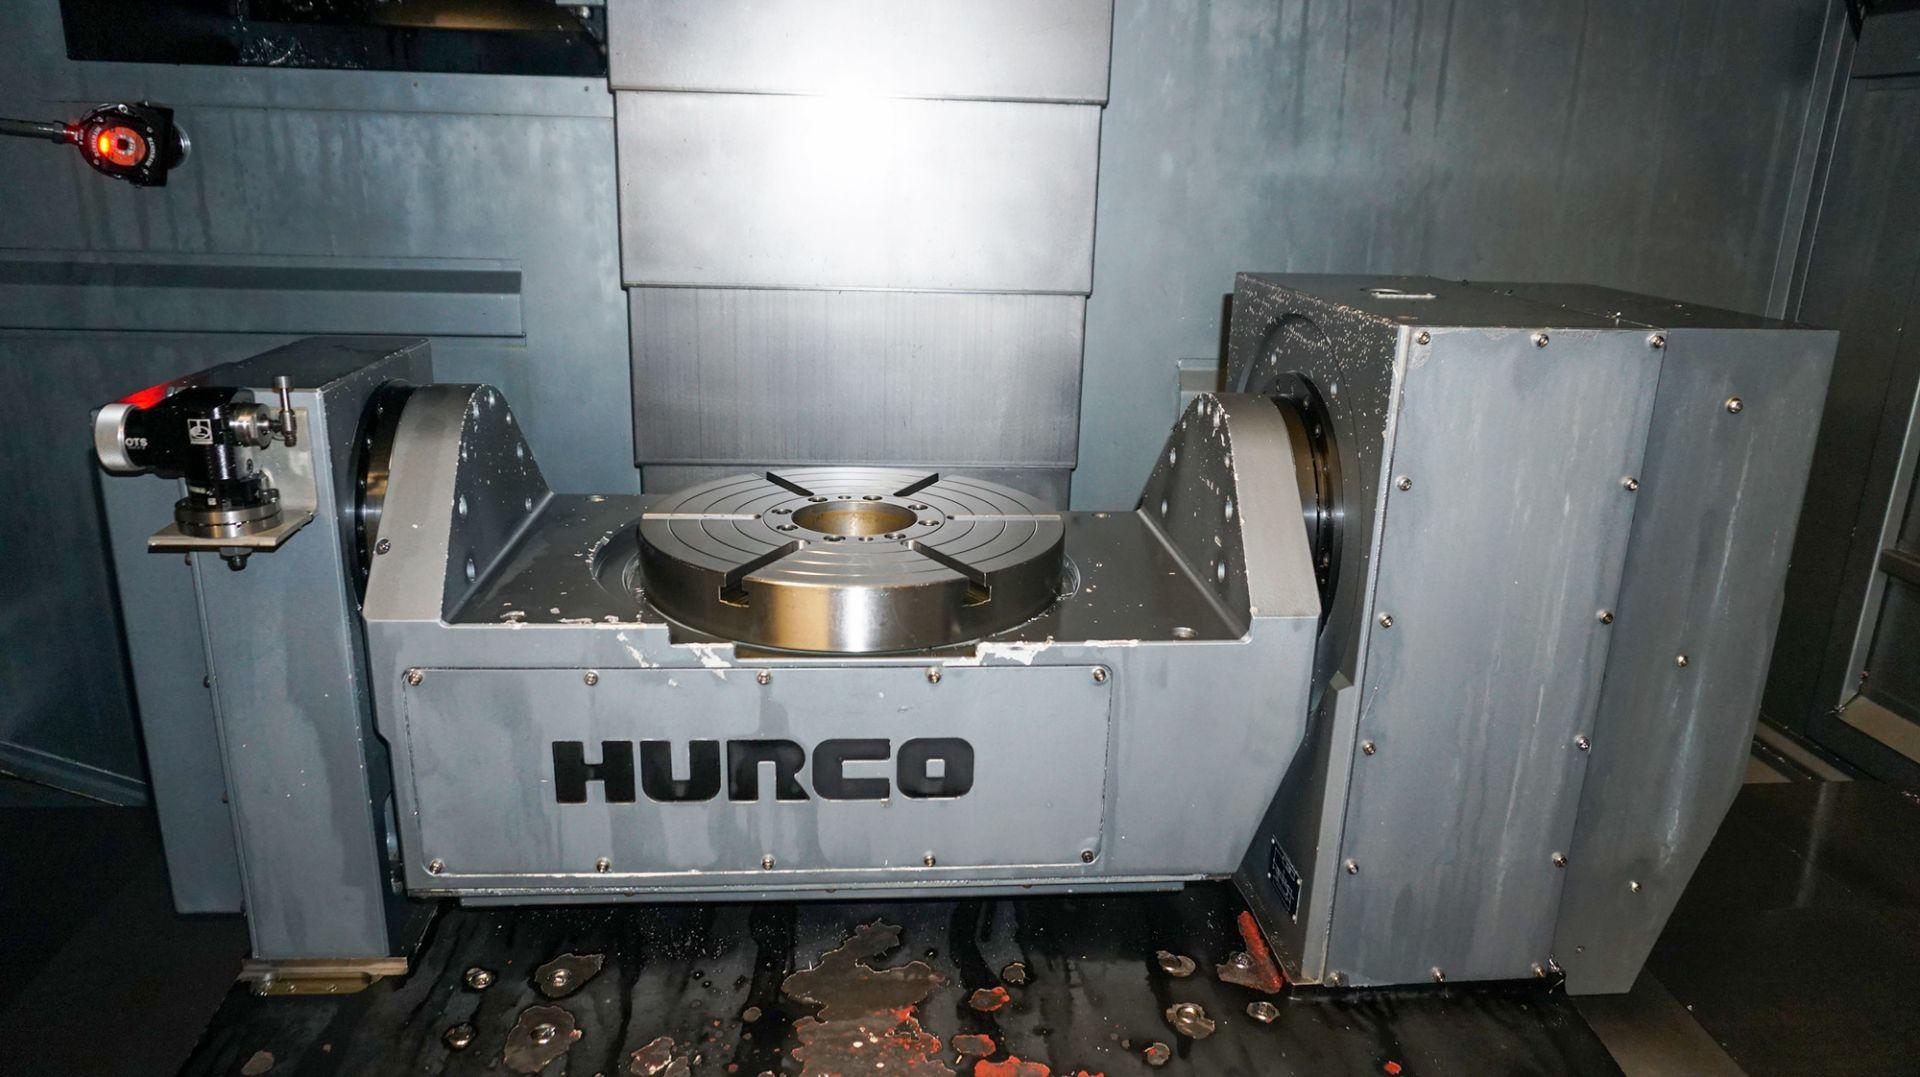 HURCO (2012) VMX42UI 5 AXIS CNC VERTICAL MACHINING CENTER WITH HURCO DUAL SCREEN CNC CONTROL, 13. - Image 6 of 20